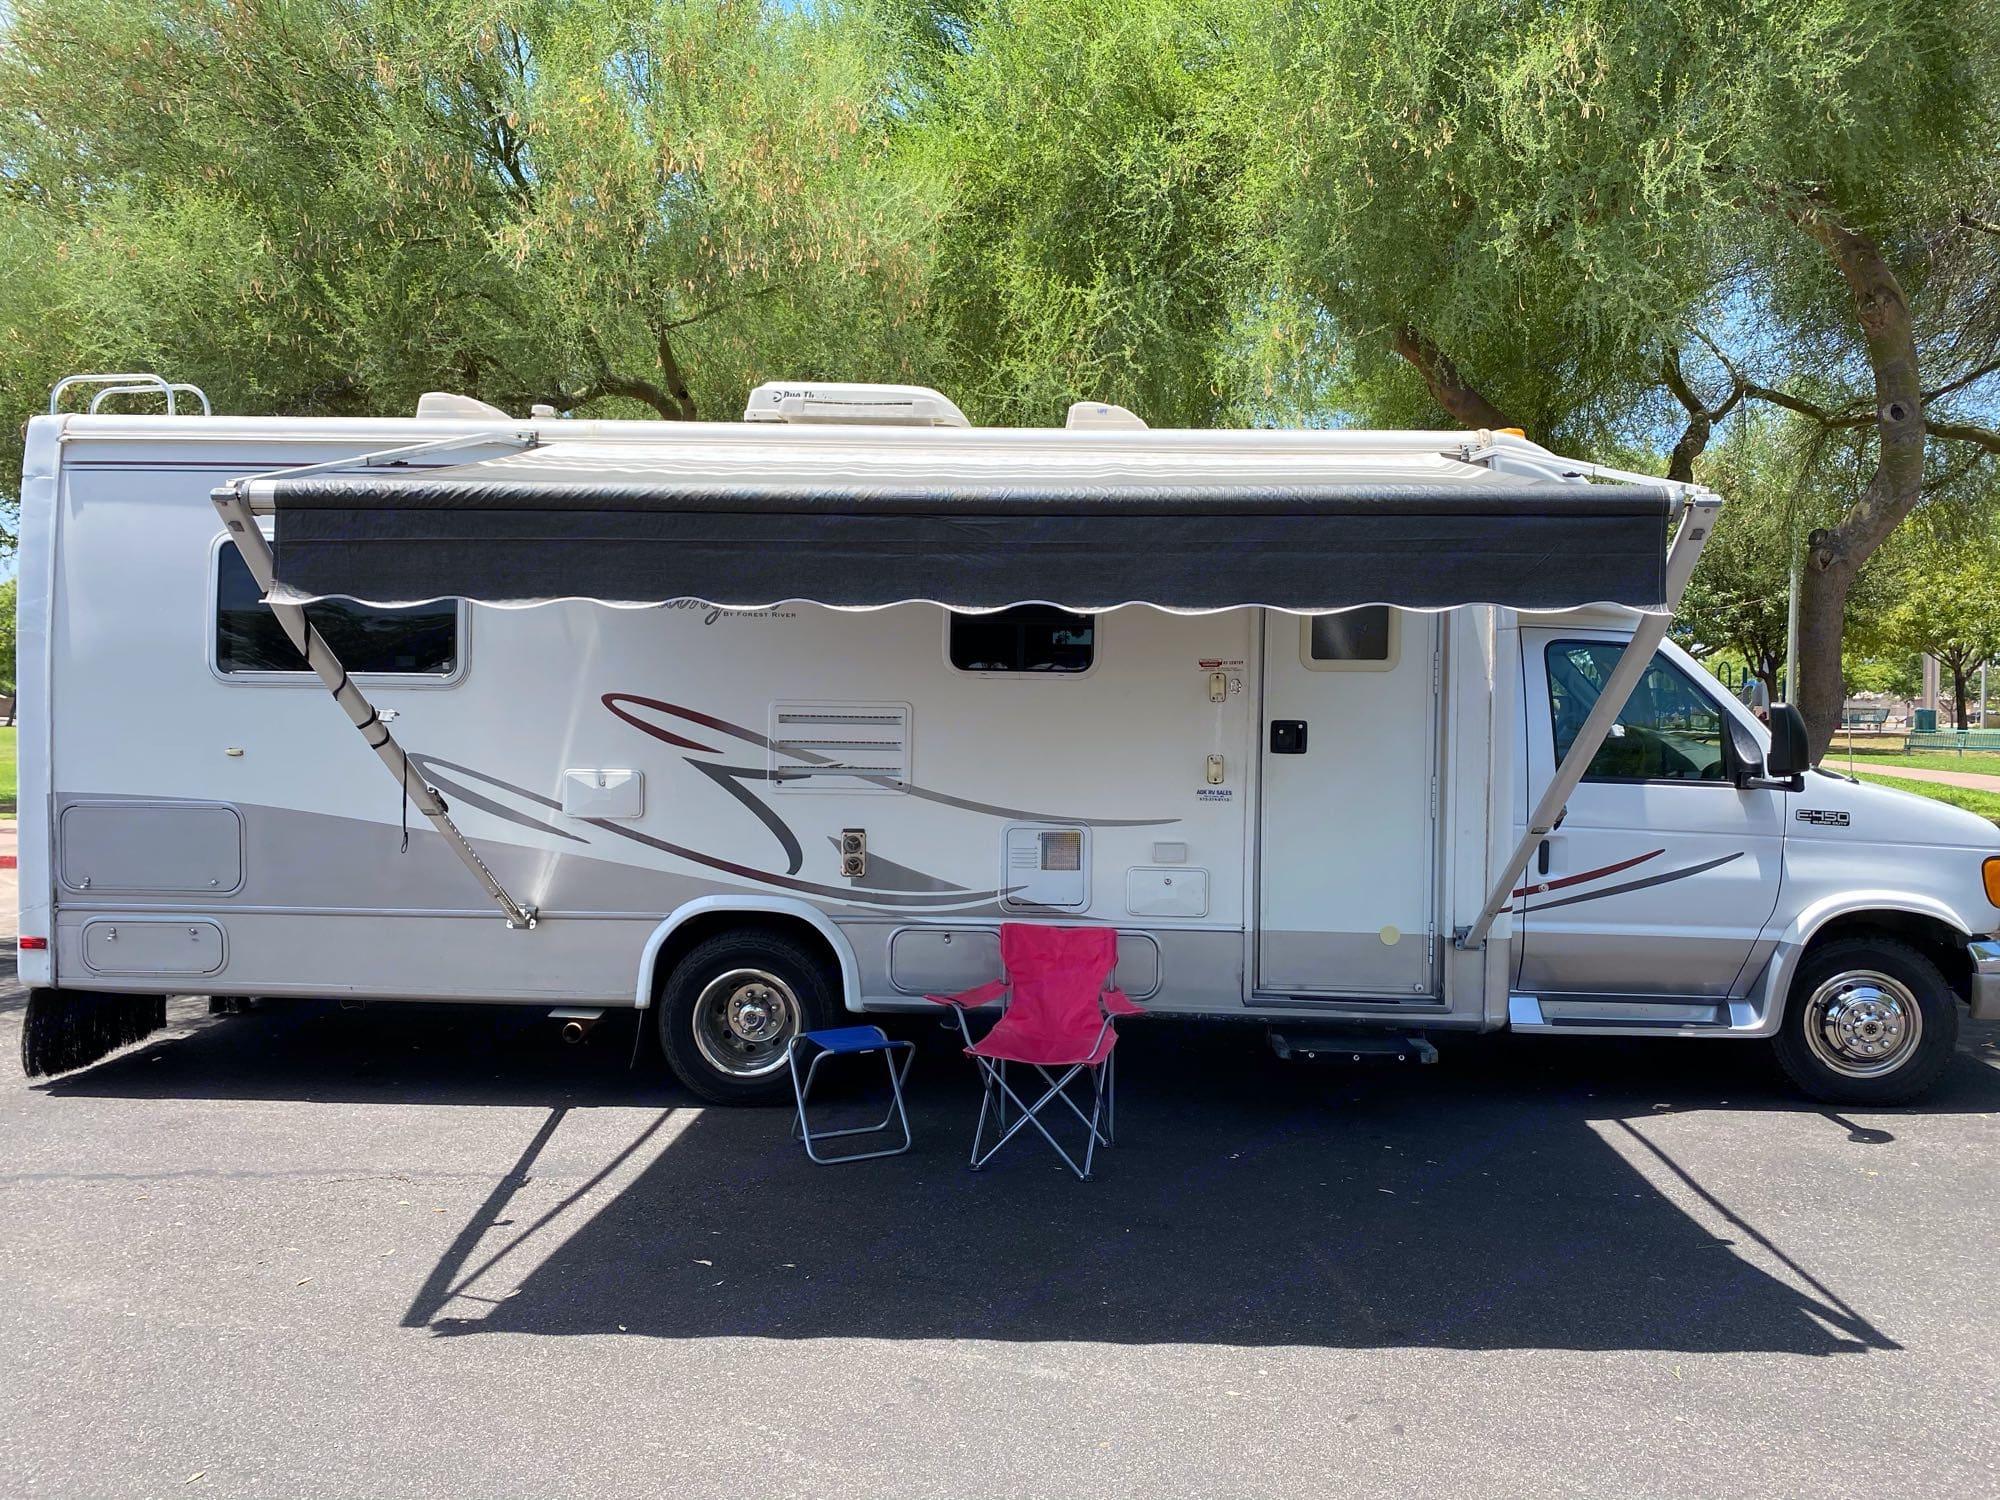 B+ RV camper van - LEXIE - easy to drive & park. Forest River Lexington 2004